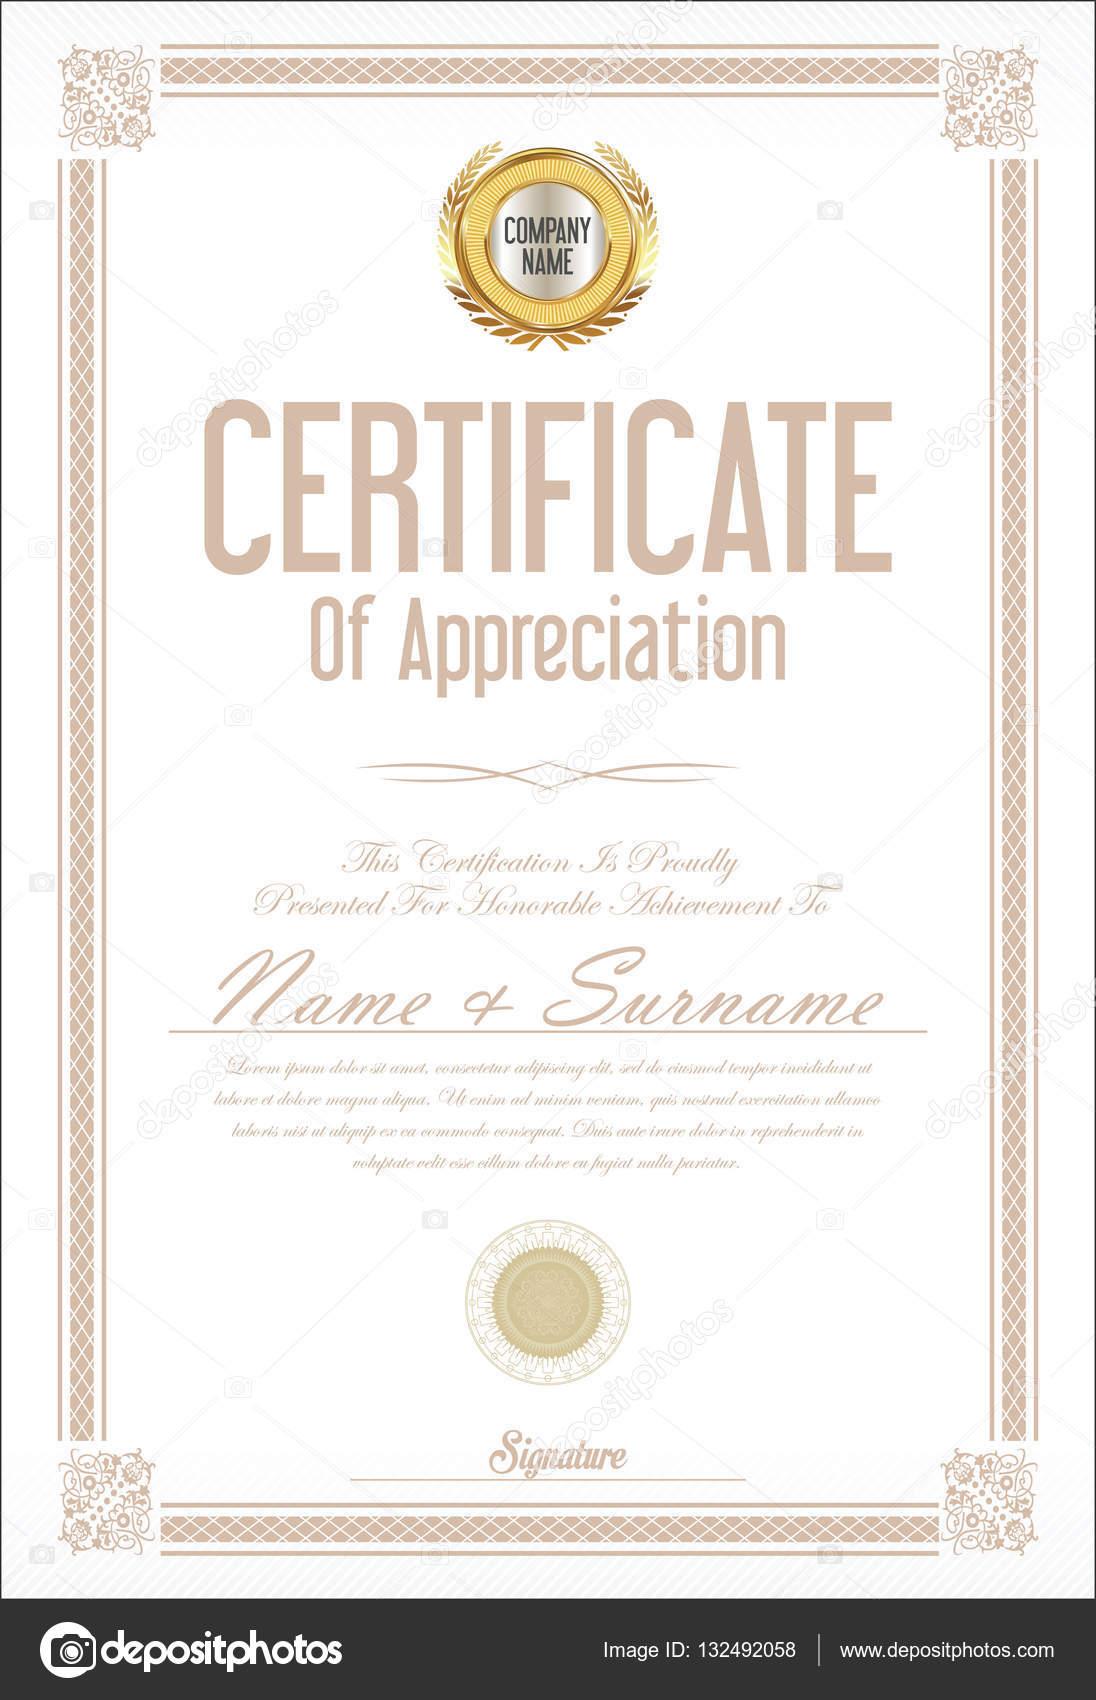 Zertifikat oder Diplom Vorlage Retro-design — Stockvektor ...